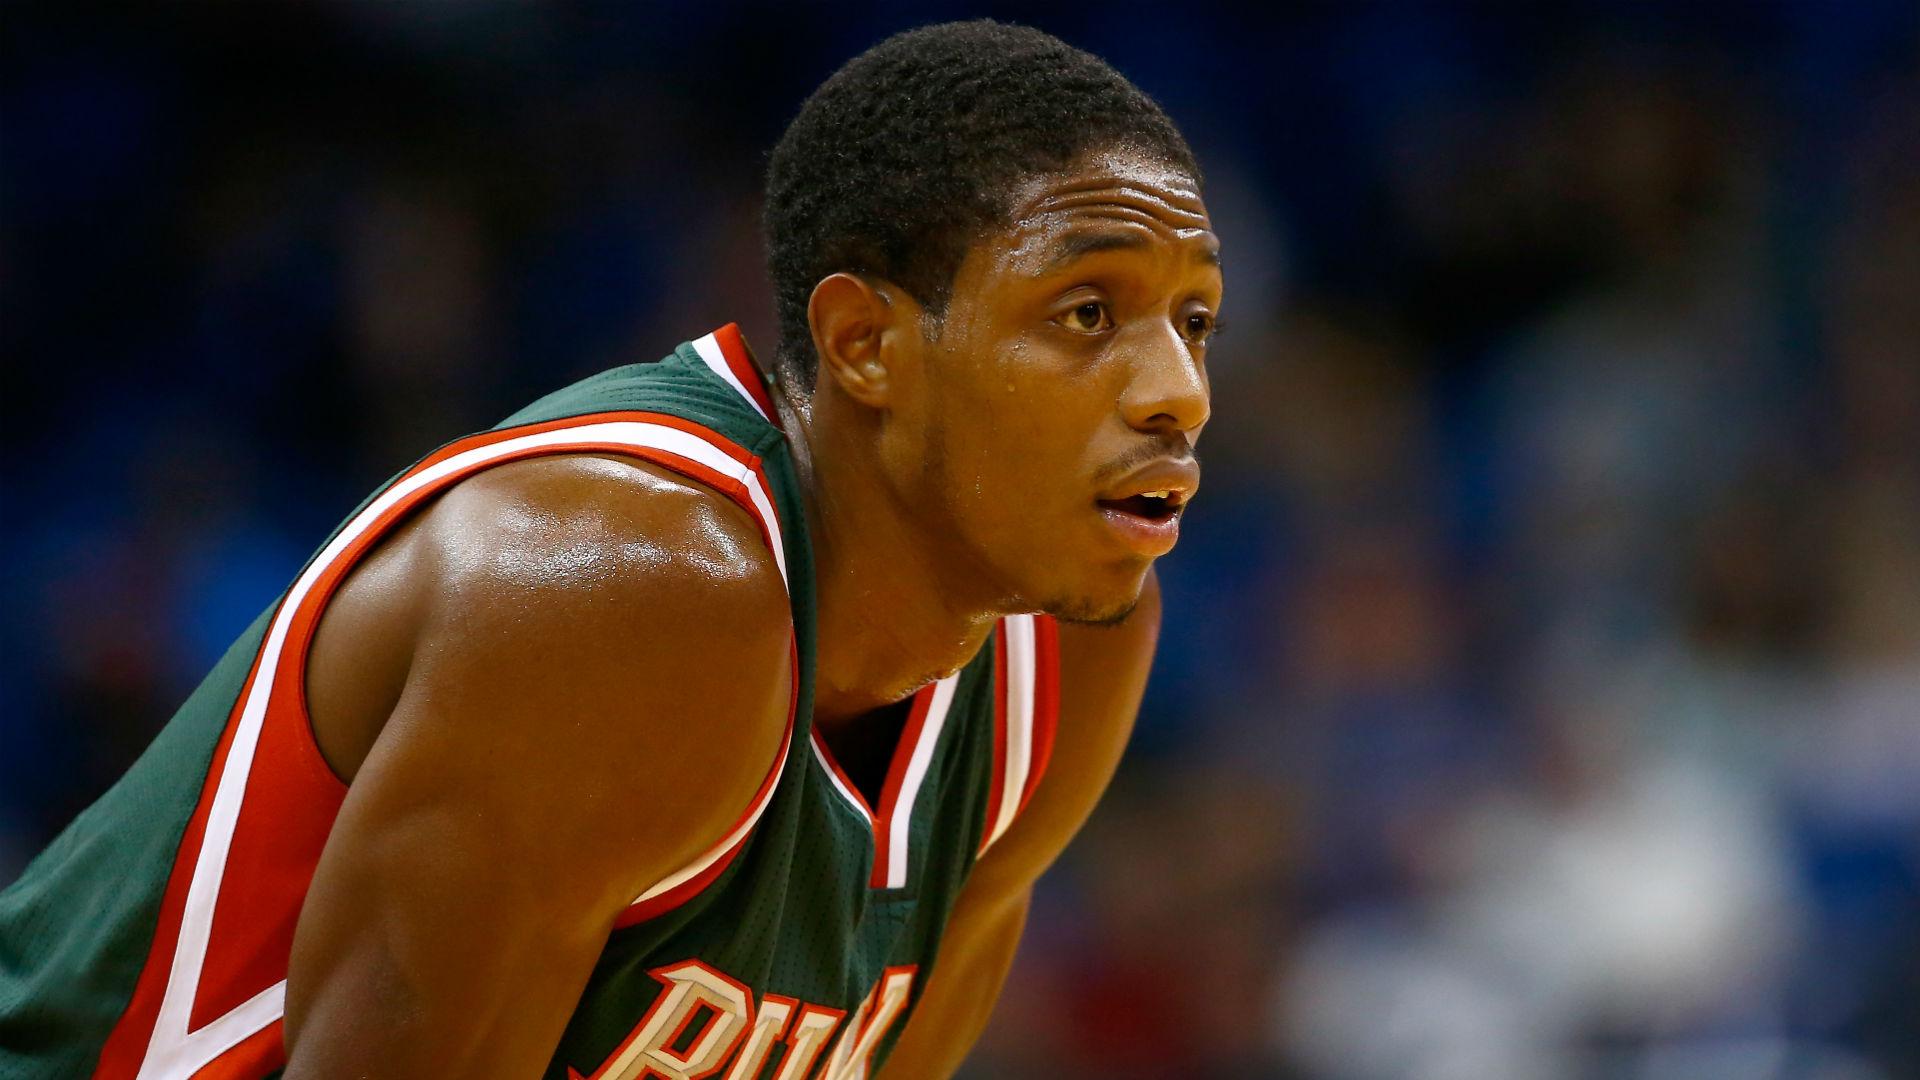 AccuScore NBA pick - Struggling Knicks take their show to Milwaukee